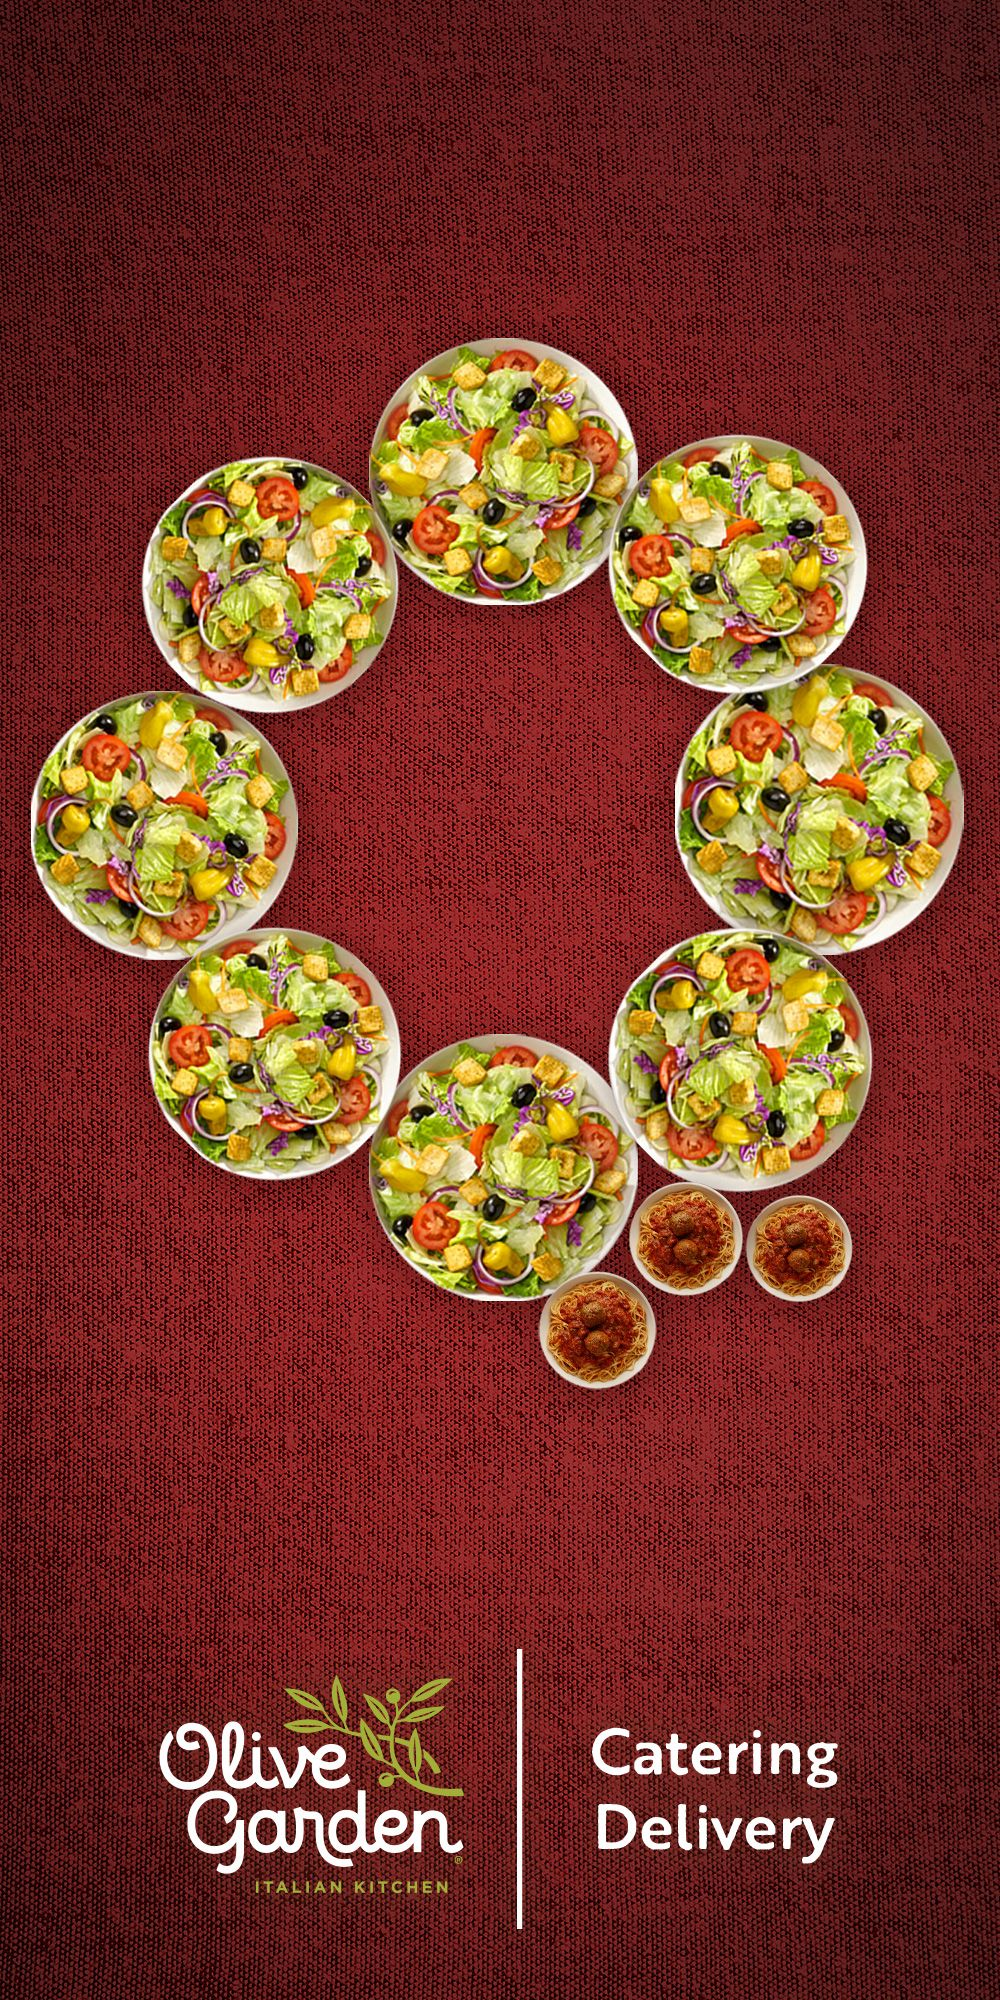 Feeling festive? So are we! Order Olive Garden catering